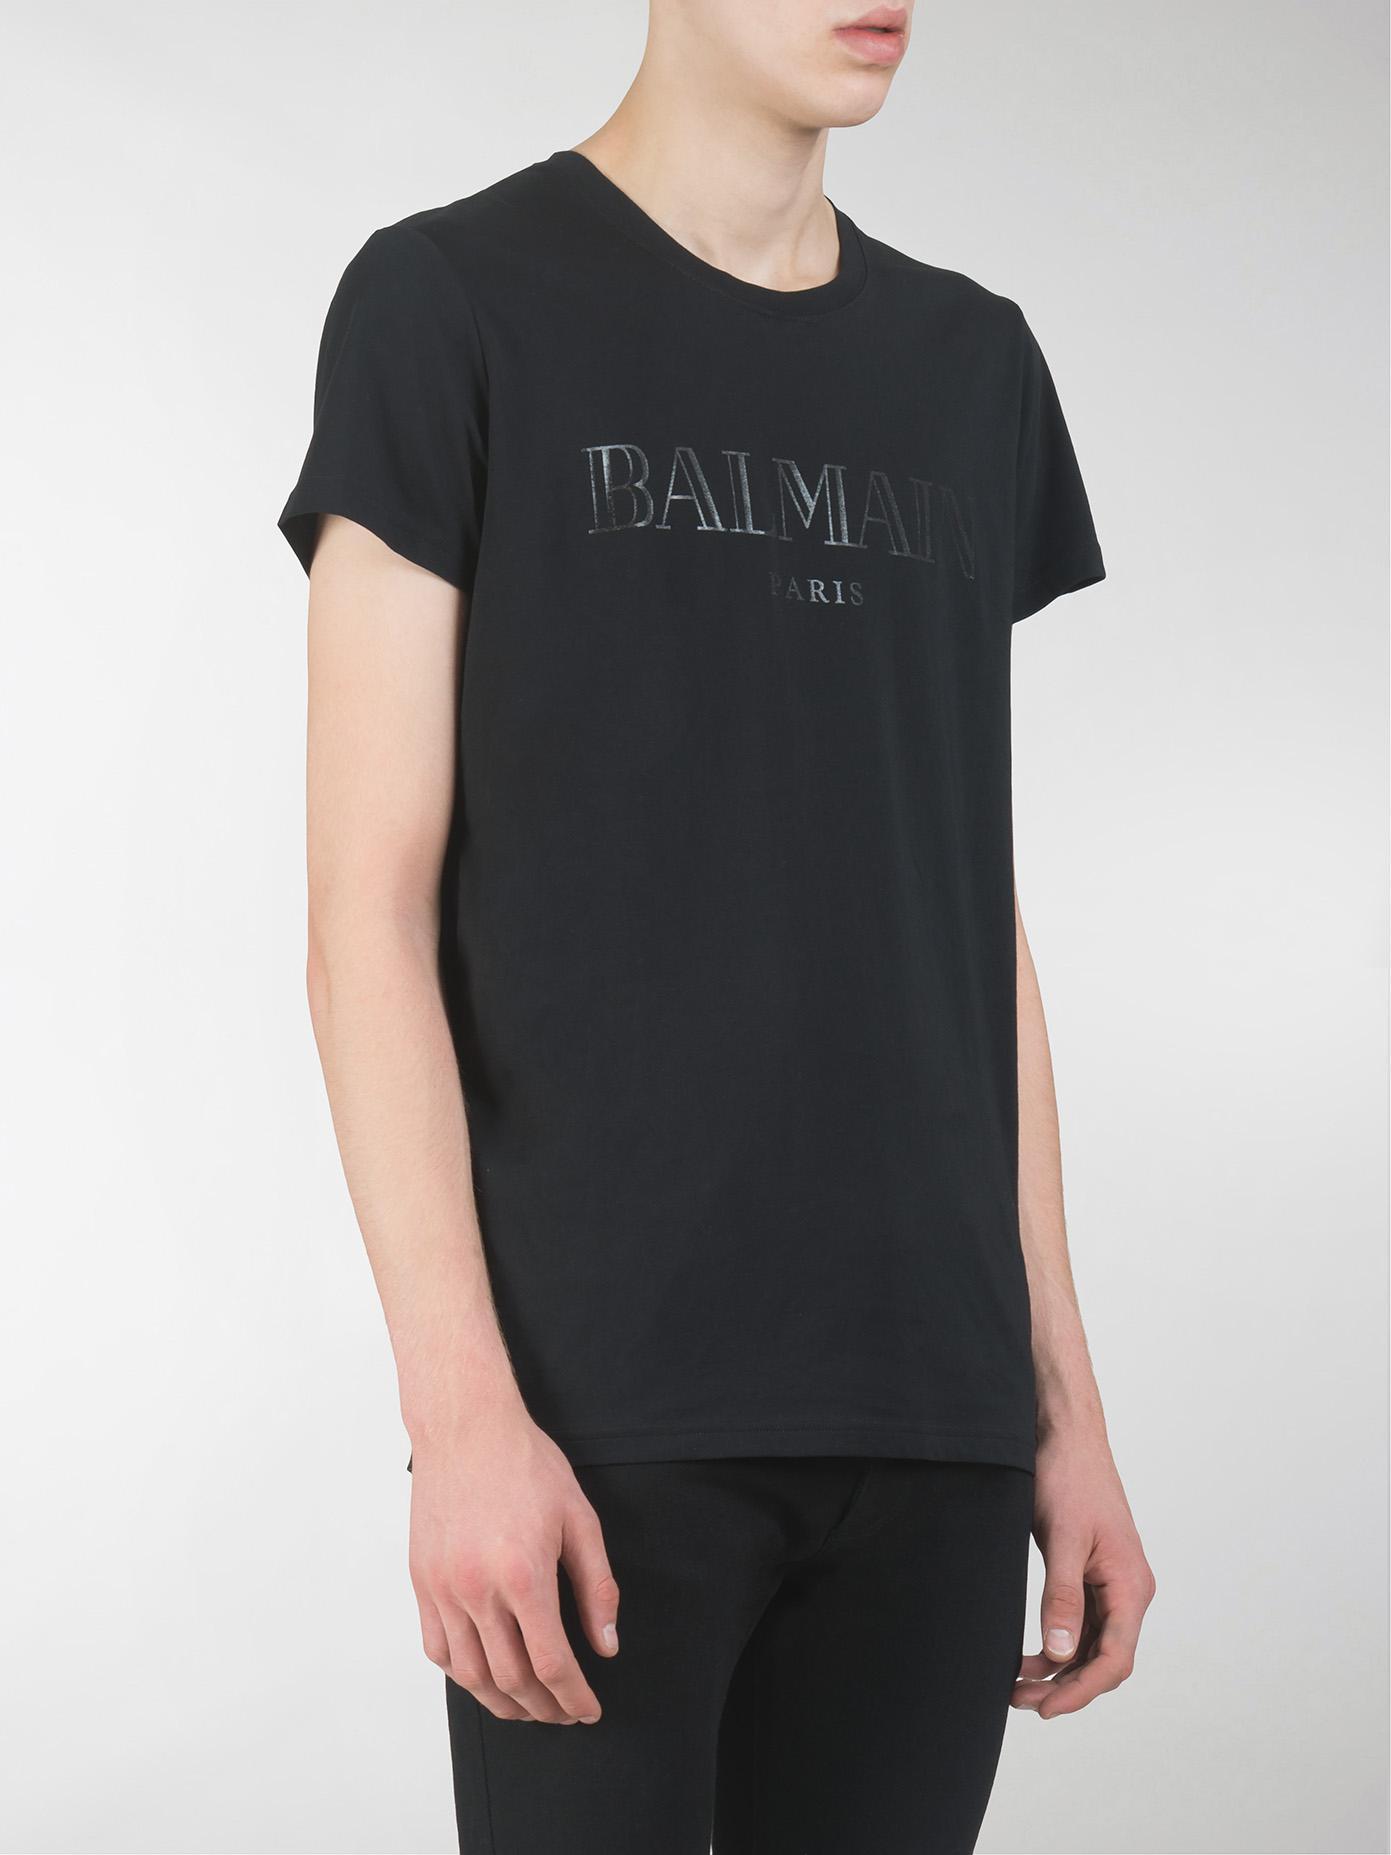 lyst balmain tshirt blanc print paris noir in black for men. Black Bedroom Furniture Sets. Home Design Ideas